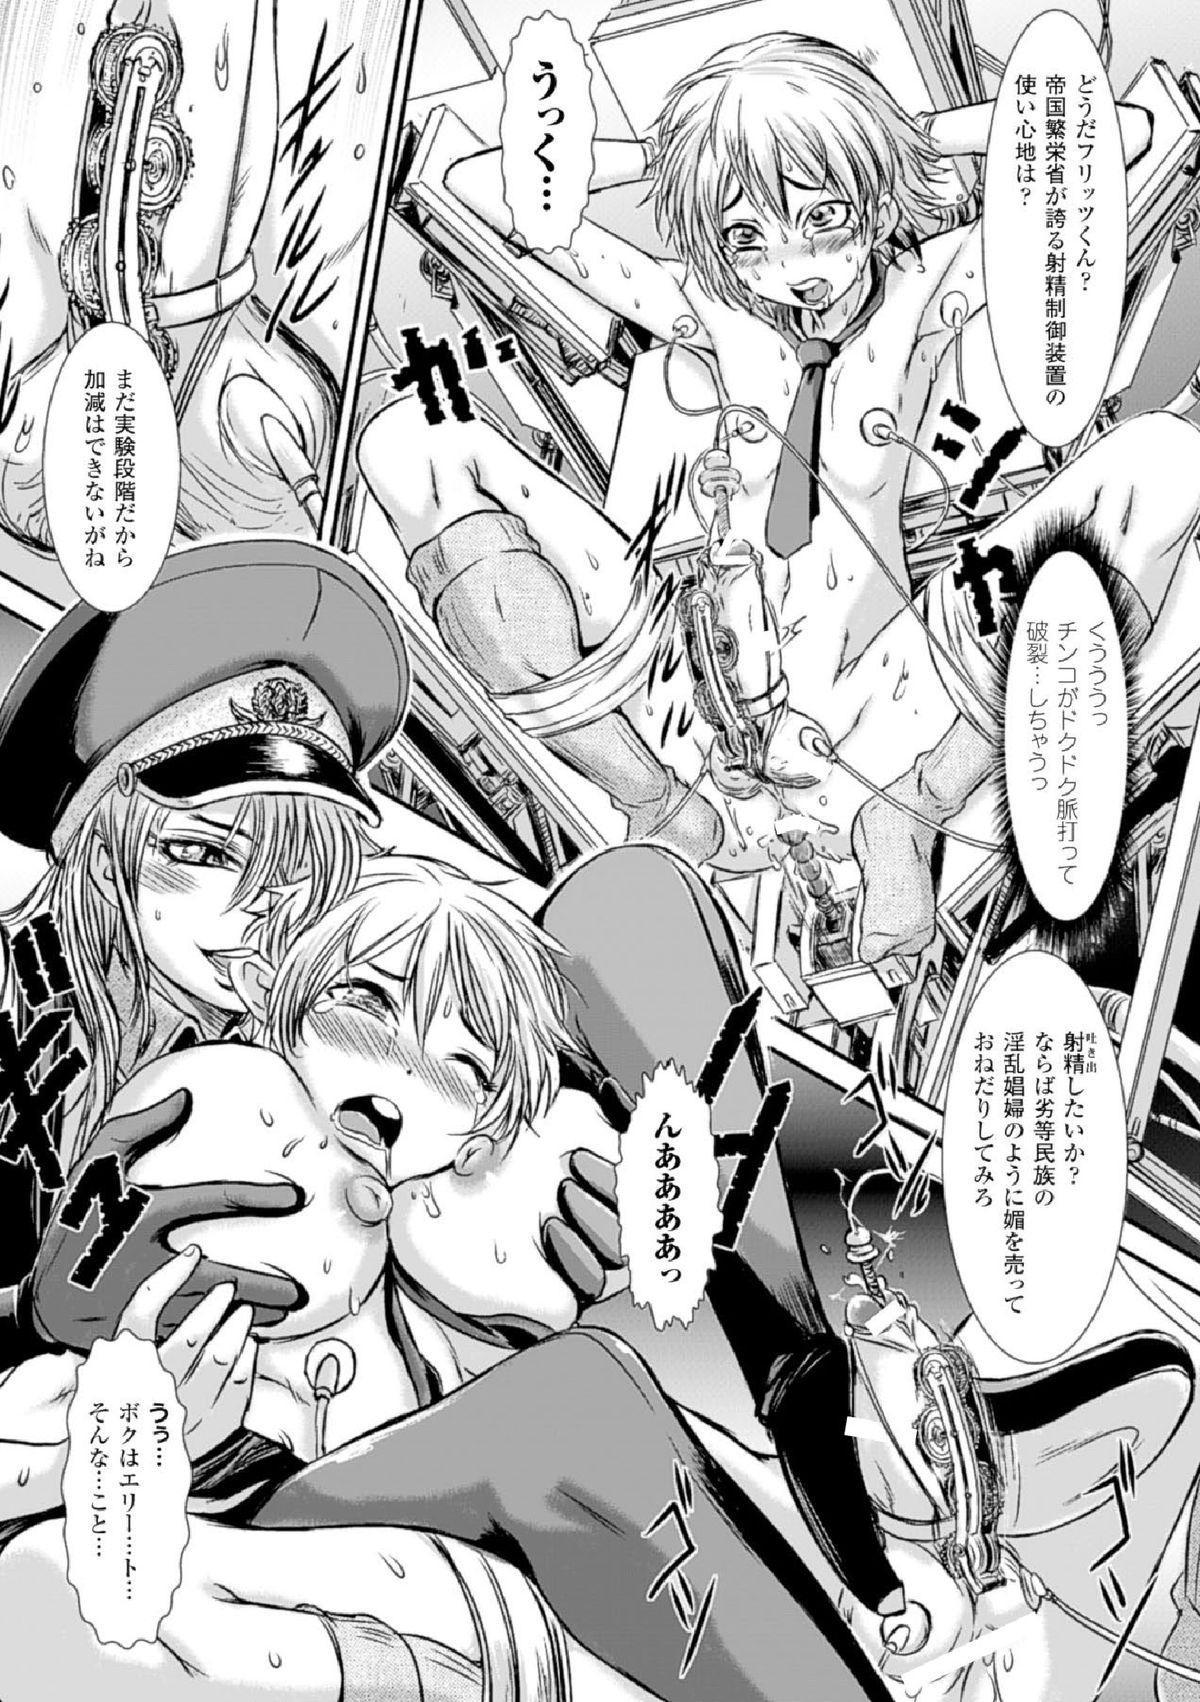 Haiboku Heroine Kaizou Choukyou Inferno 165